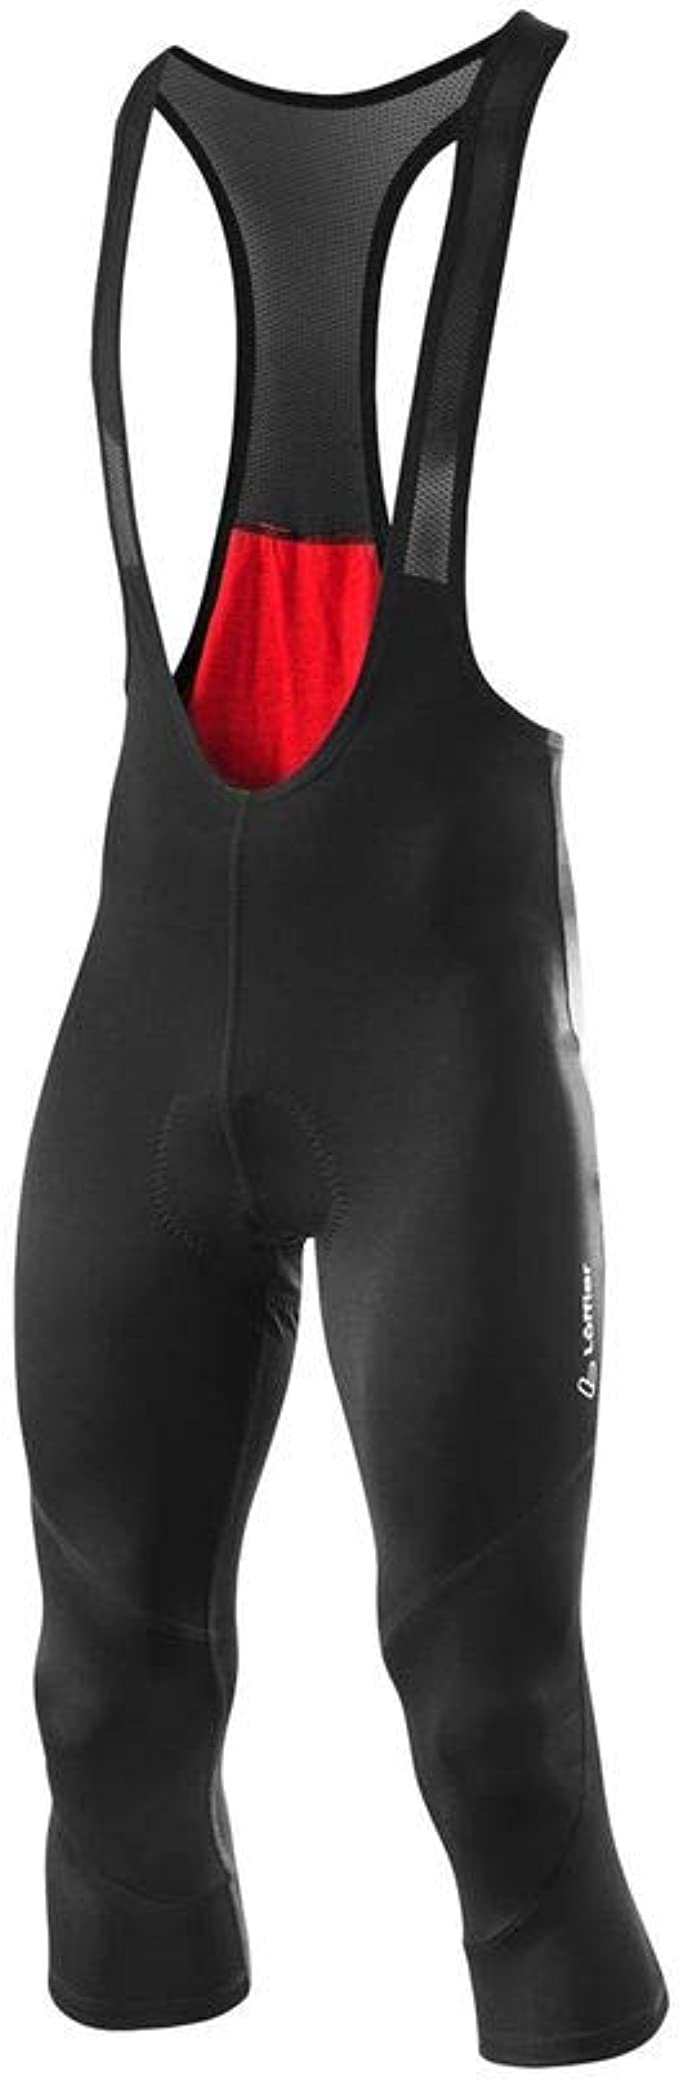 Cycling Shorts with Seat Padding L/ÖFFLER Bike 3//4 Bib Tights Basic Gel Mens 23484